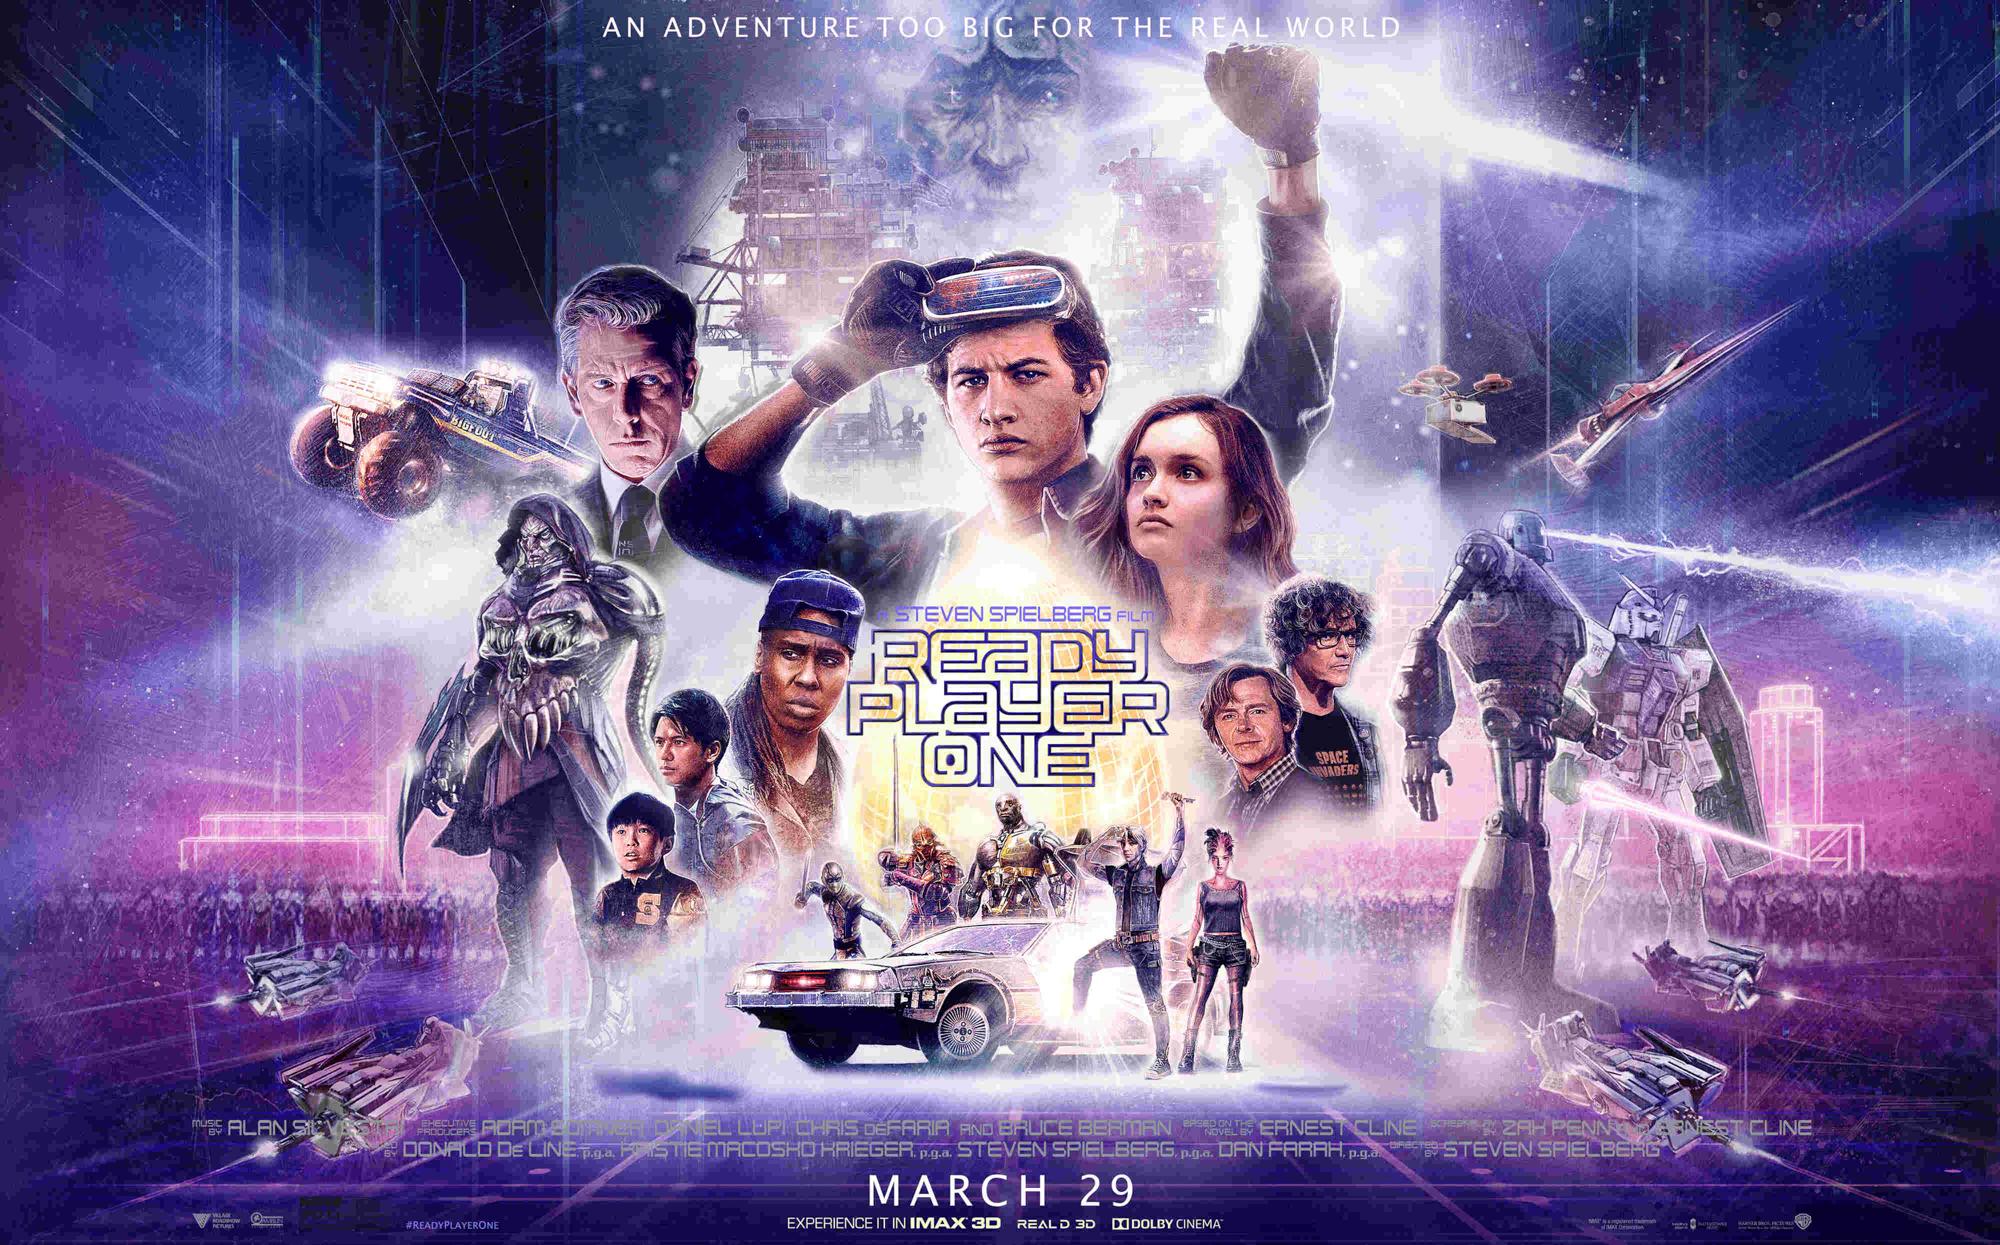 Image Courtesy of Warner Bros. Entertainment Inc.